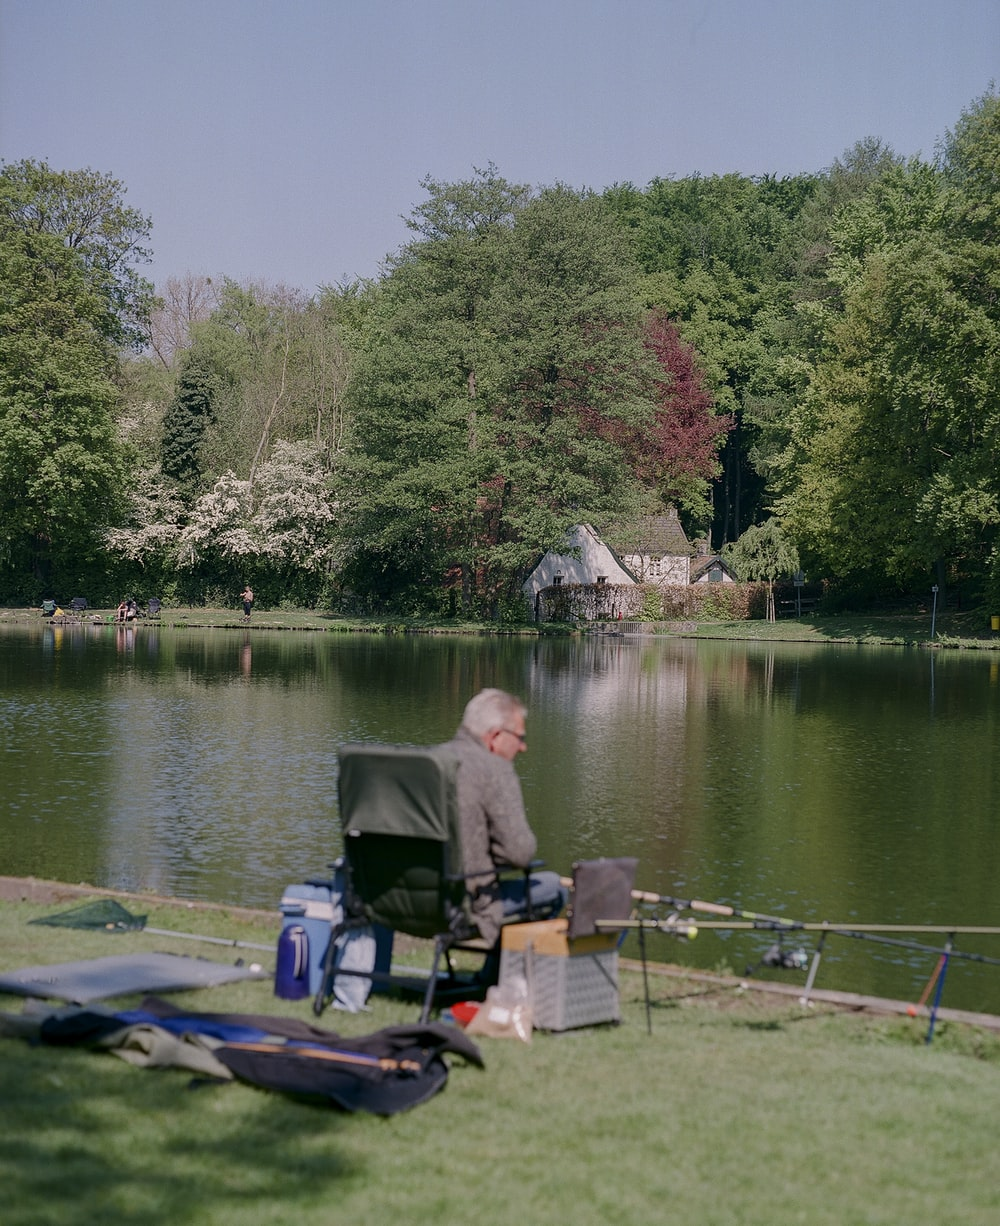 man in gray jacket sitting on green chair near lake during daytime